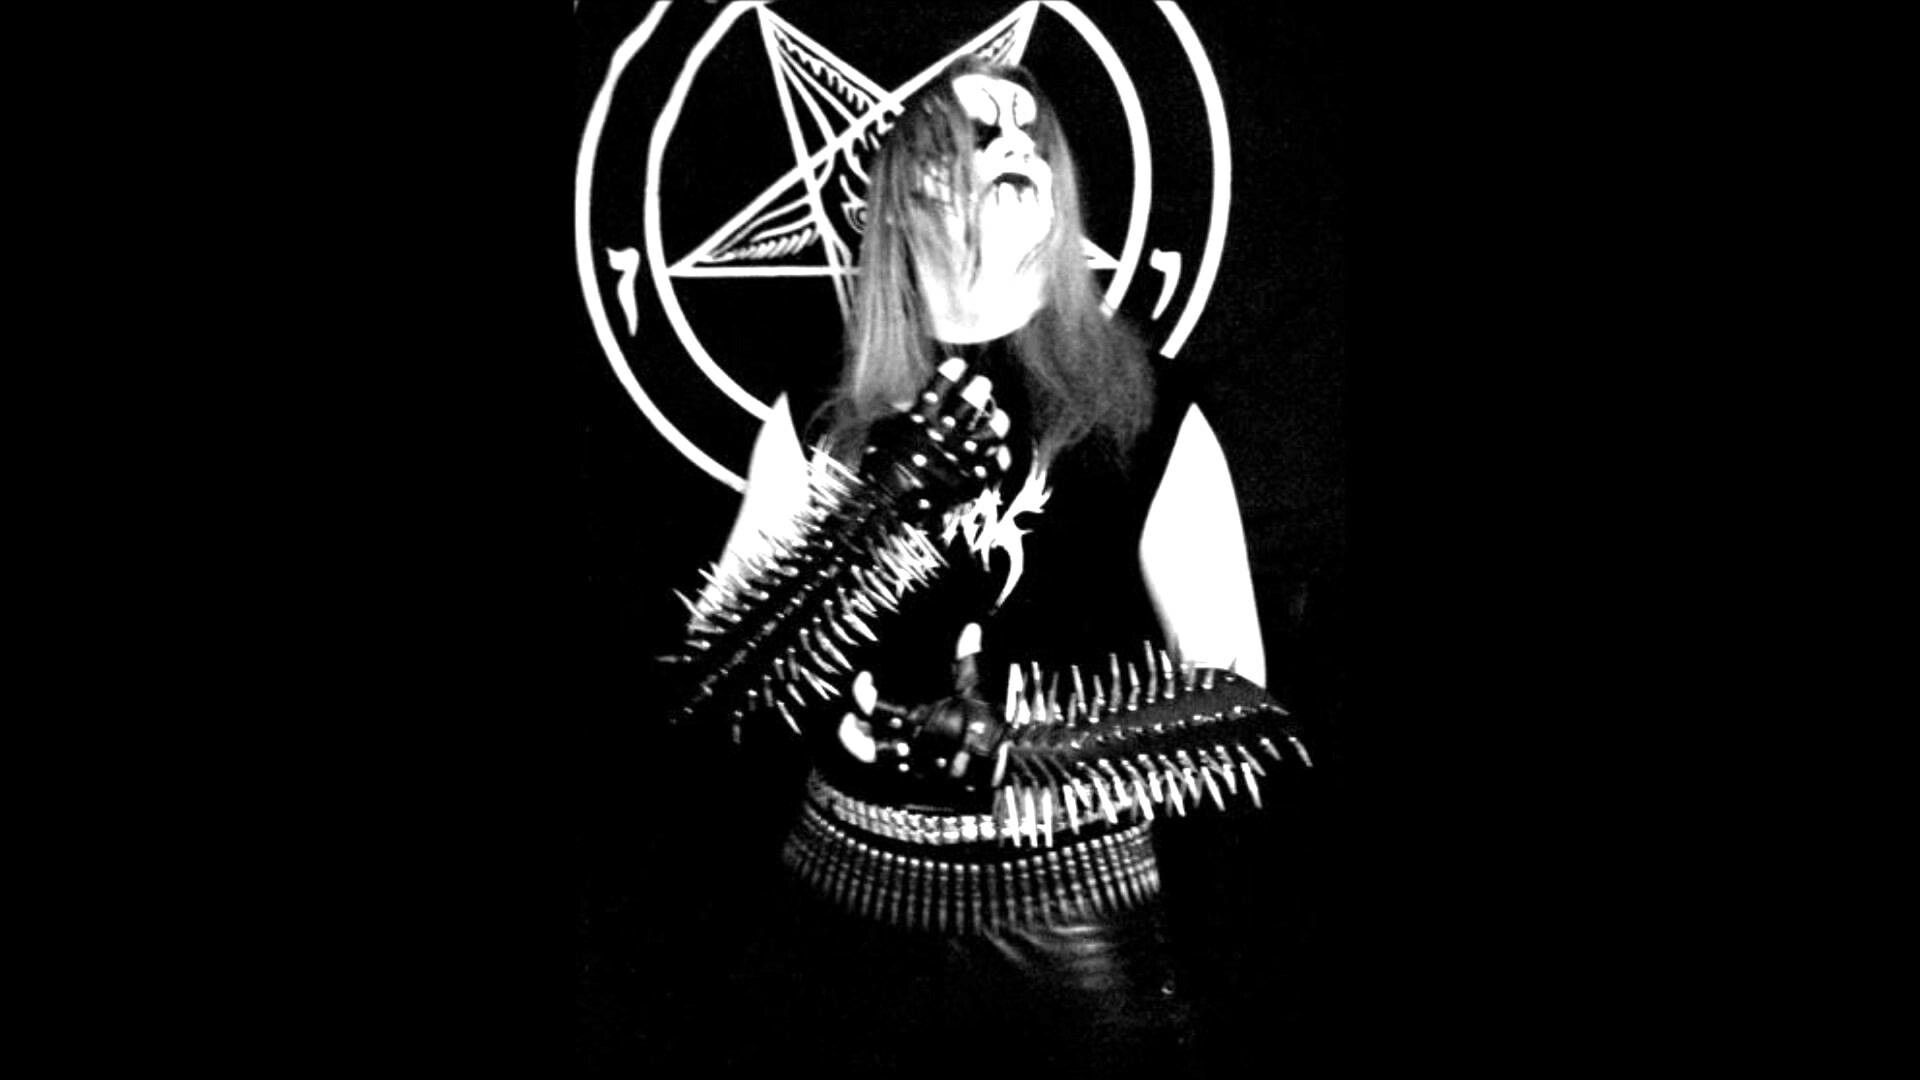 Pin By Sweet Mind On Black Metal Amazing Hd Wallpapers Black Metal Bloodborne Concept Art